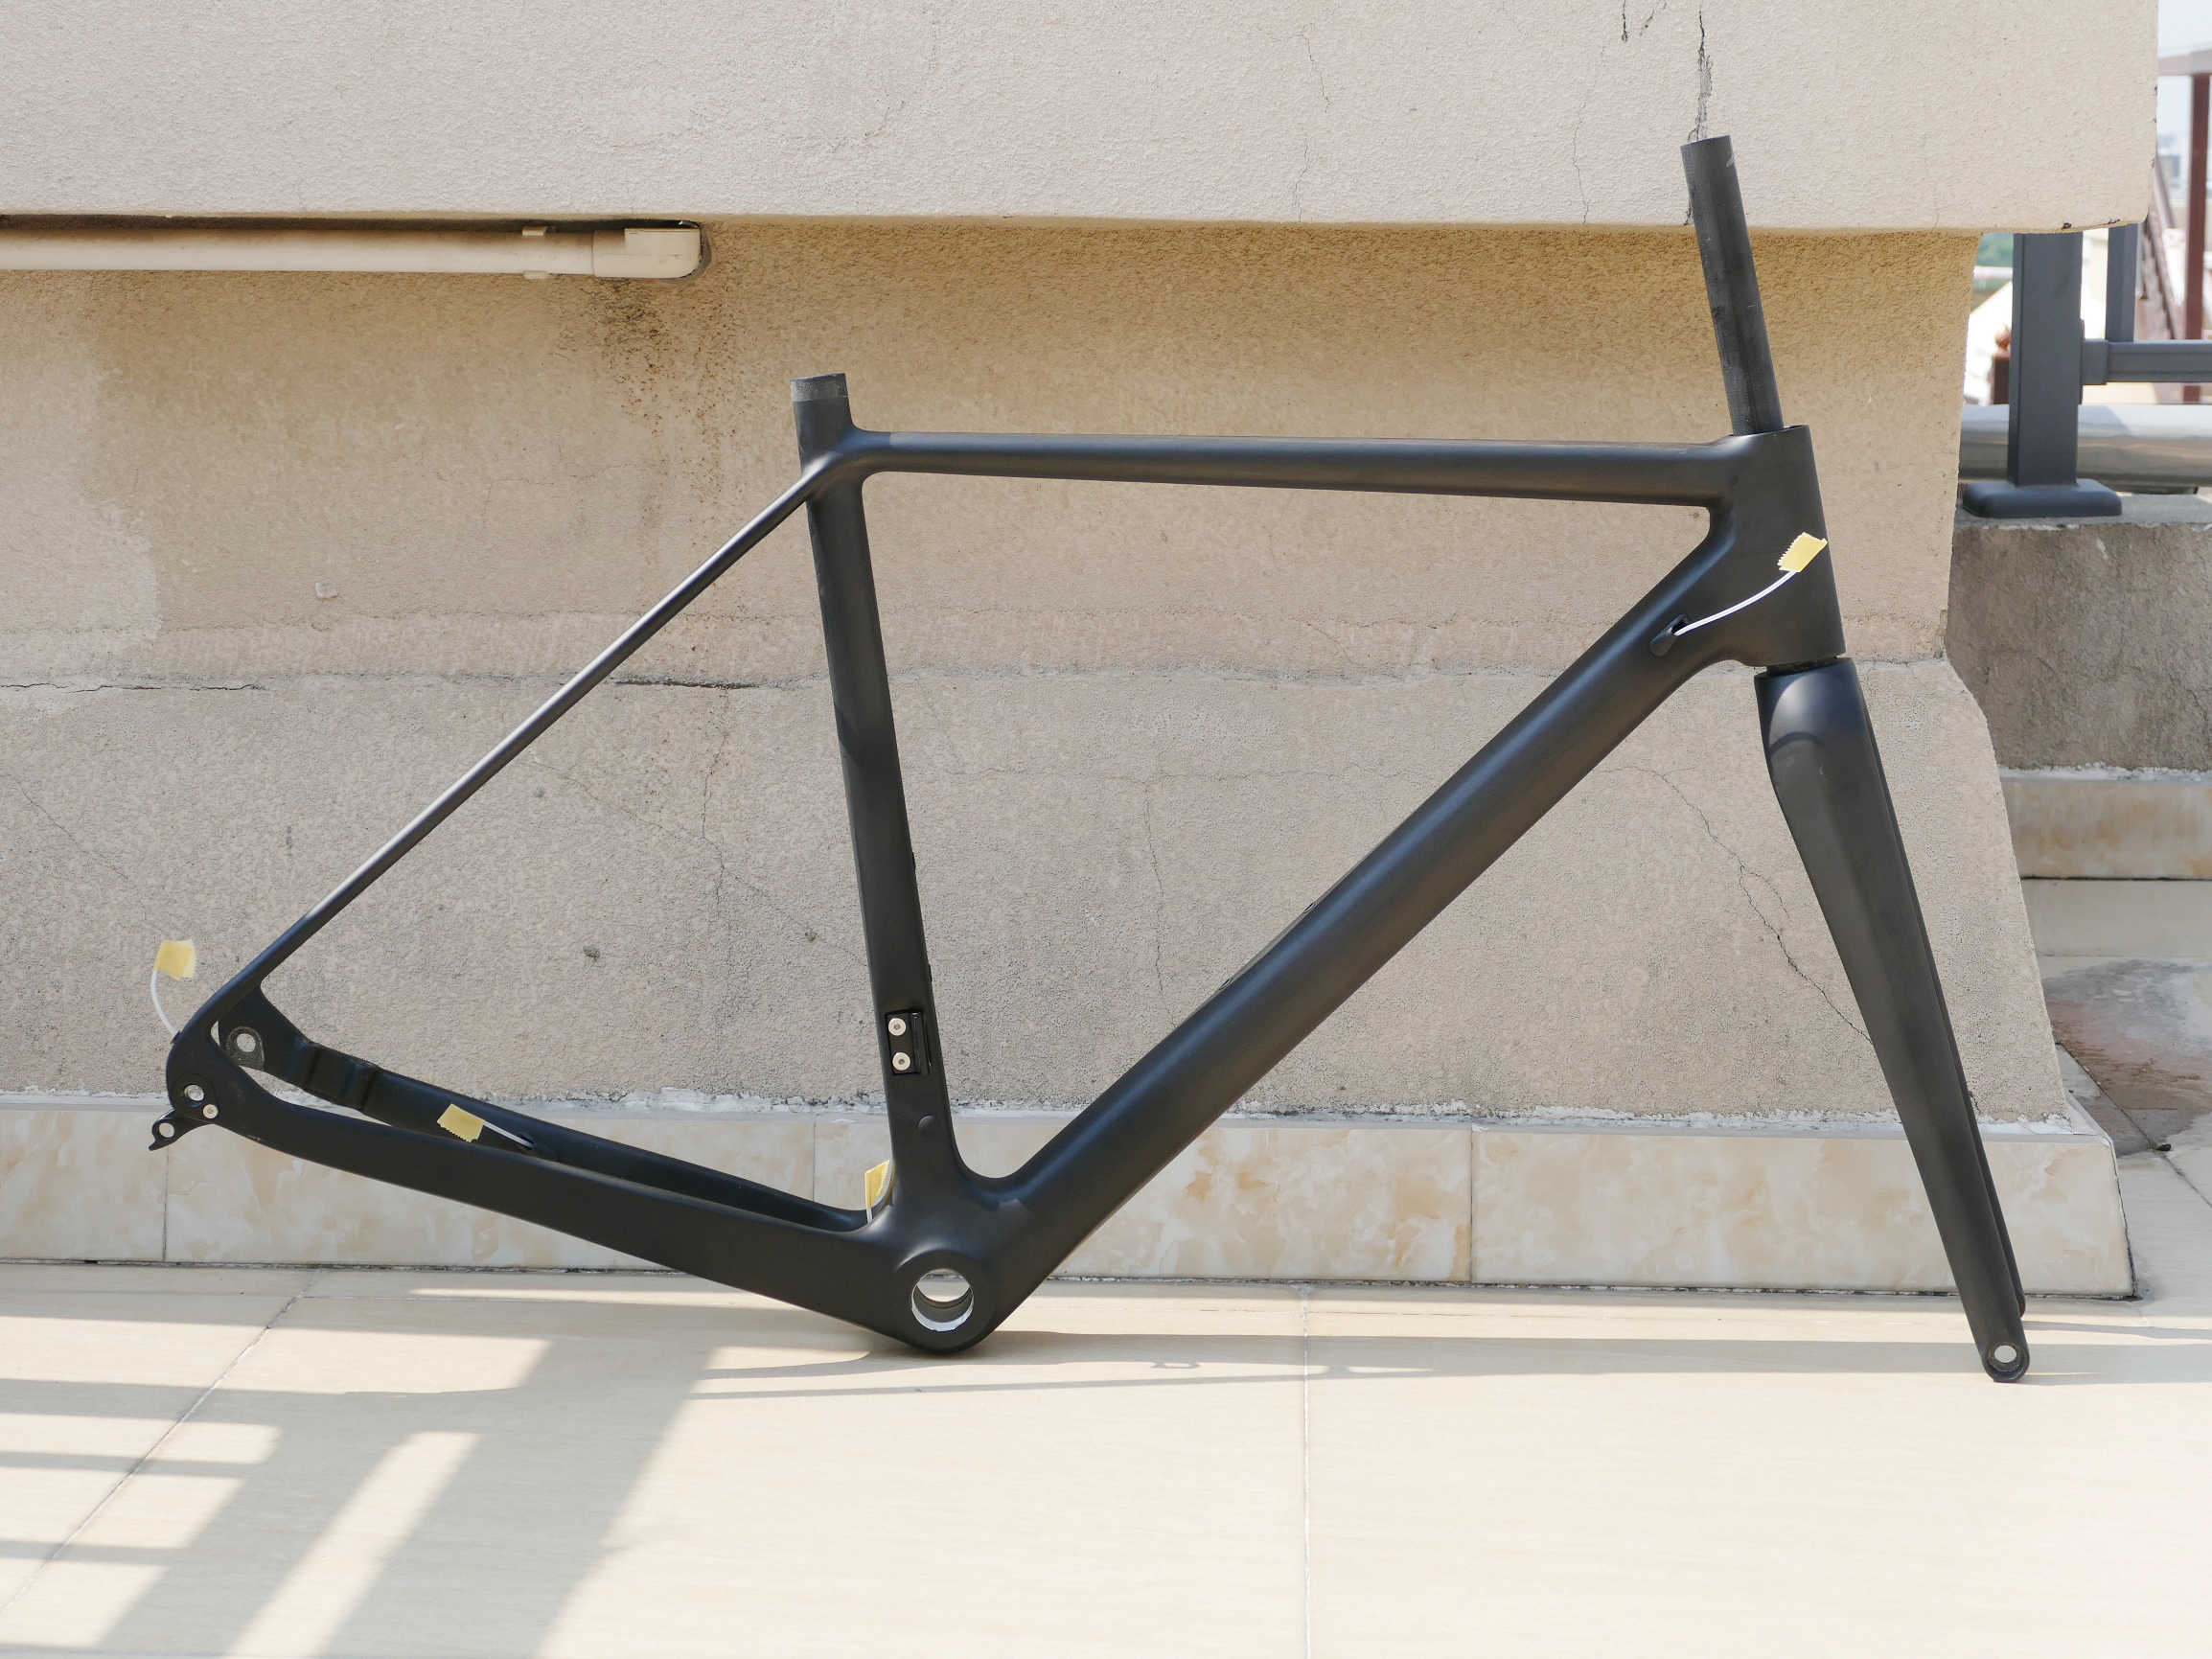 Yeni karbon Toray mat Cyclocross bisiklet fren diski bisiklet şasisi 12*142mm aks aracılığıyla + çatal 12*100mm Thru aks